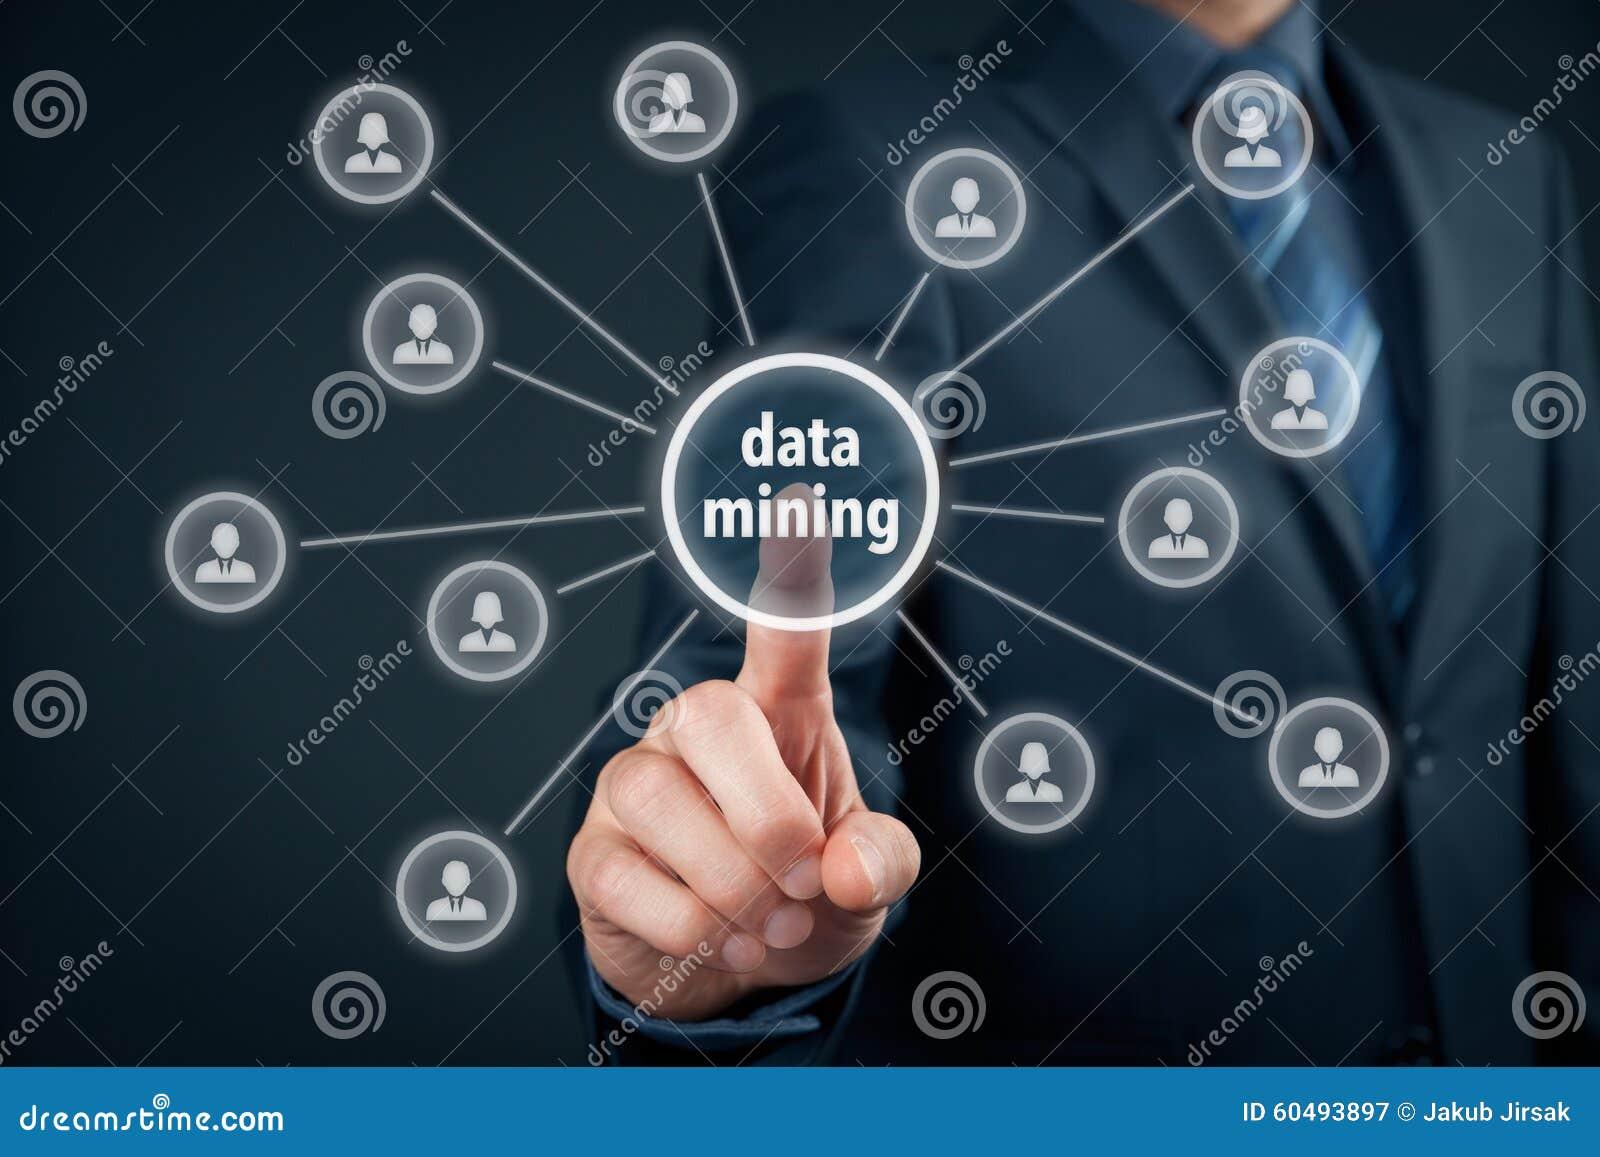 an analysis of data mining International journal of computer applications (0975 – 8887) volume 85 – no 7, january 2014 12 bank direct marketing analysis of data mining techniques hany a elsalamony.